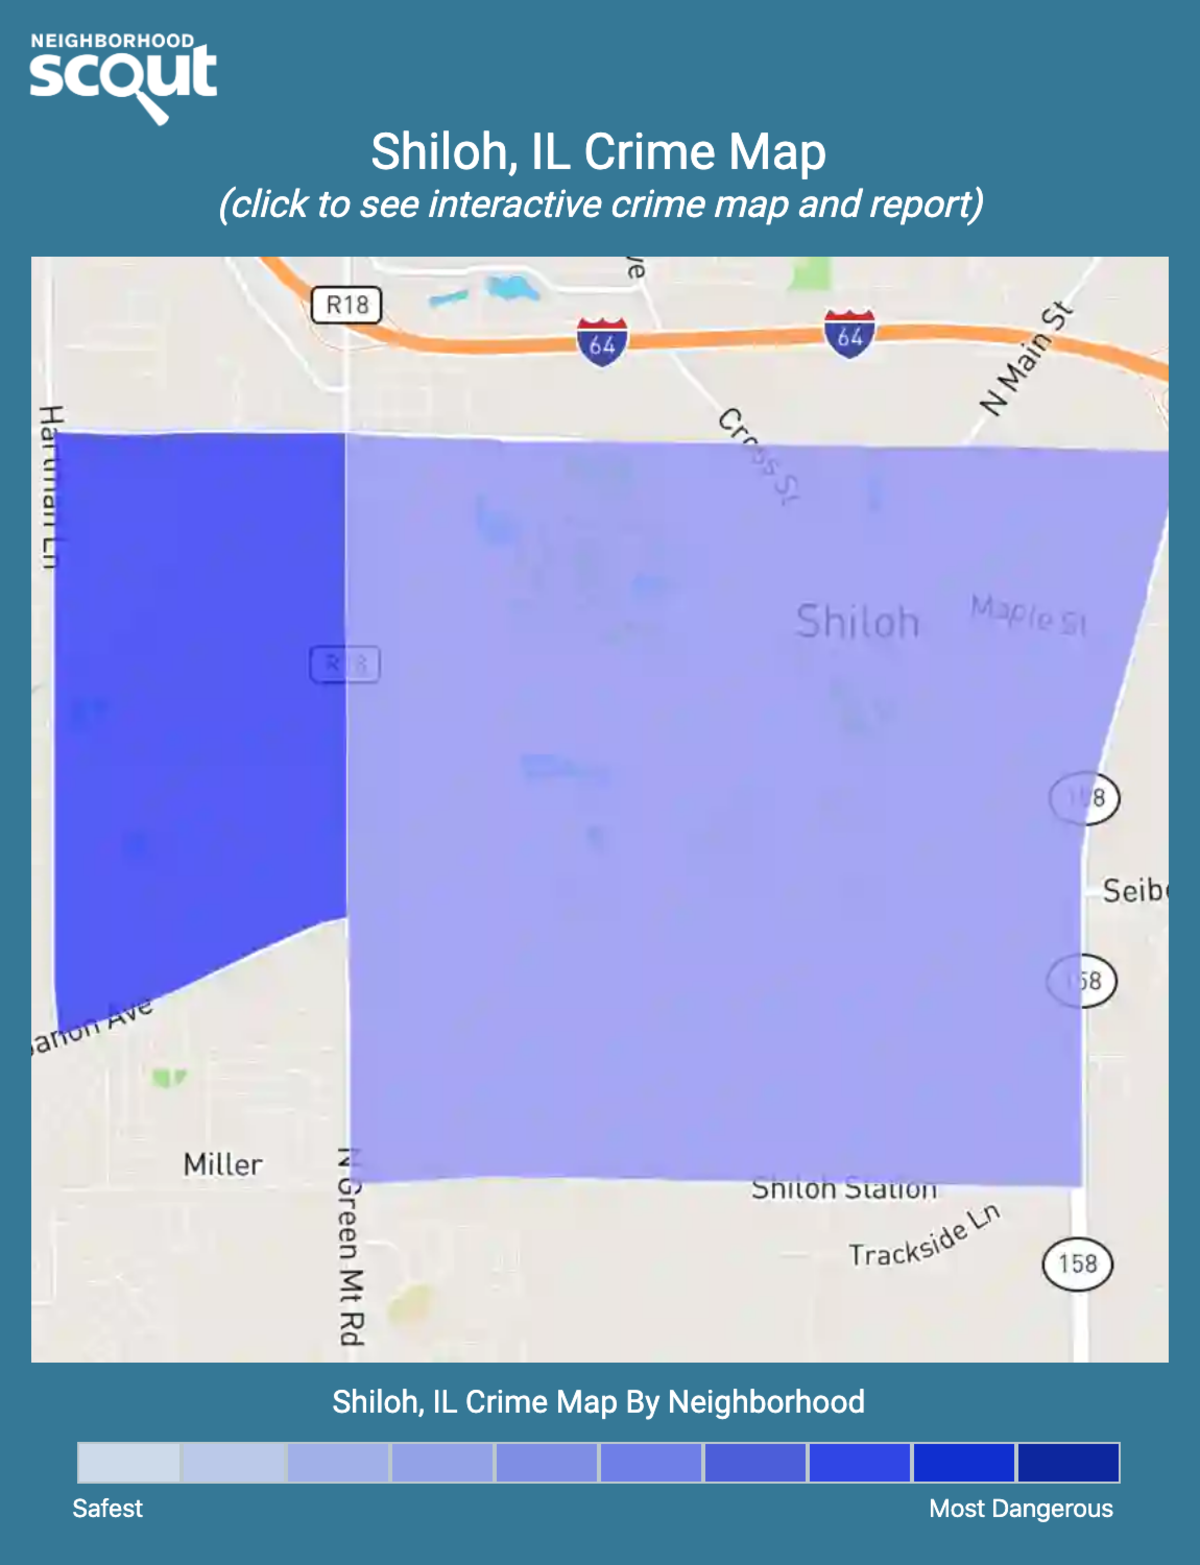 Shiloh, Illinois crime map